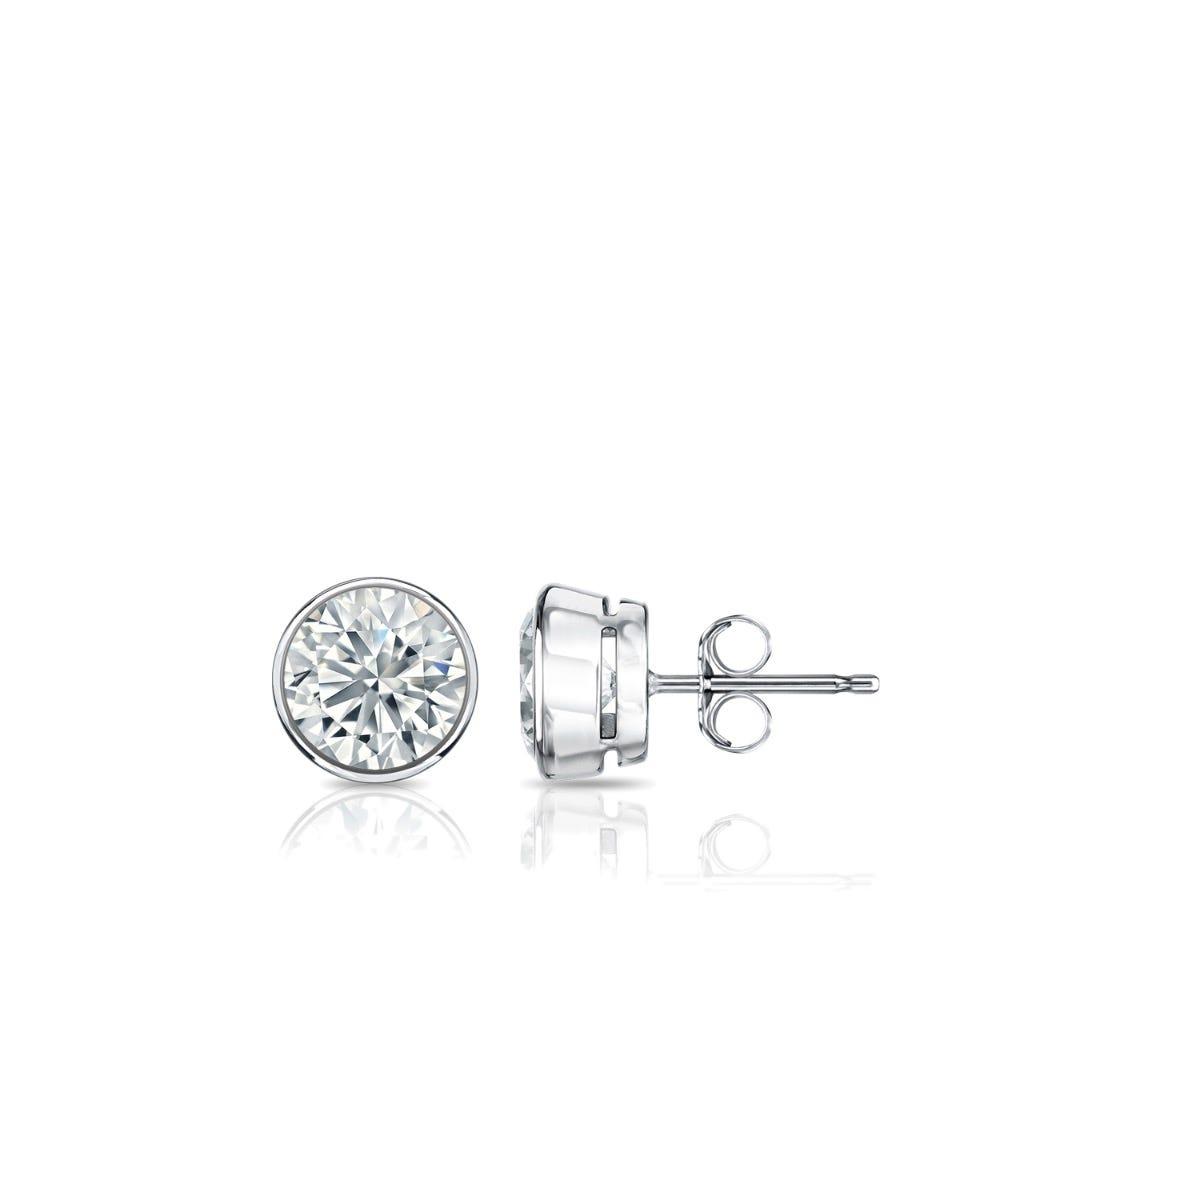 Diamond Round Bezel-Set 1/3ctw. Solitaire Stud (IJ-SI2) Earrings in Platinum